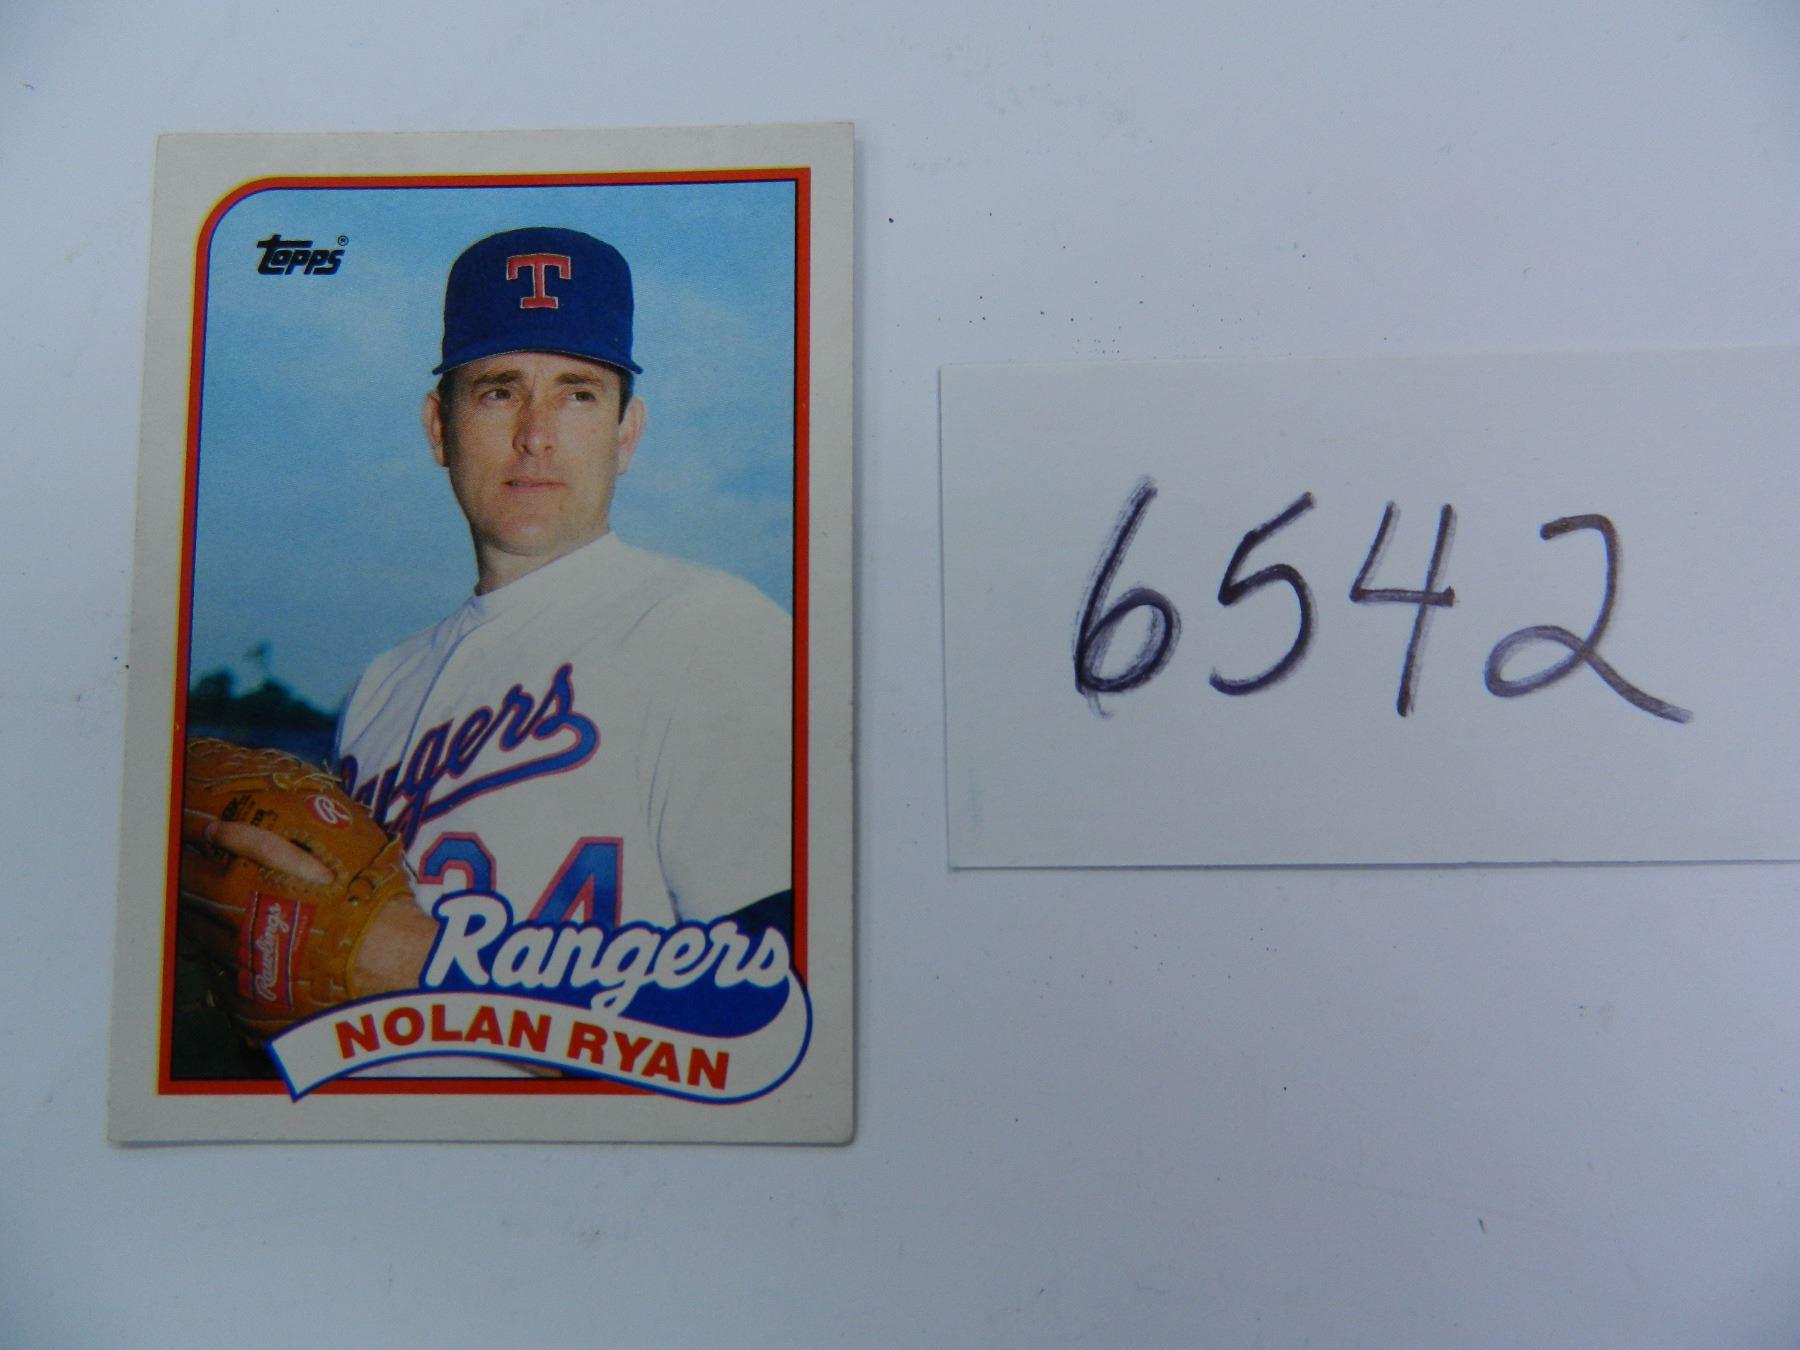 Four 4 1989 Topps Nolan Ryan 106t Baseball Cards All